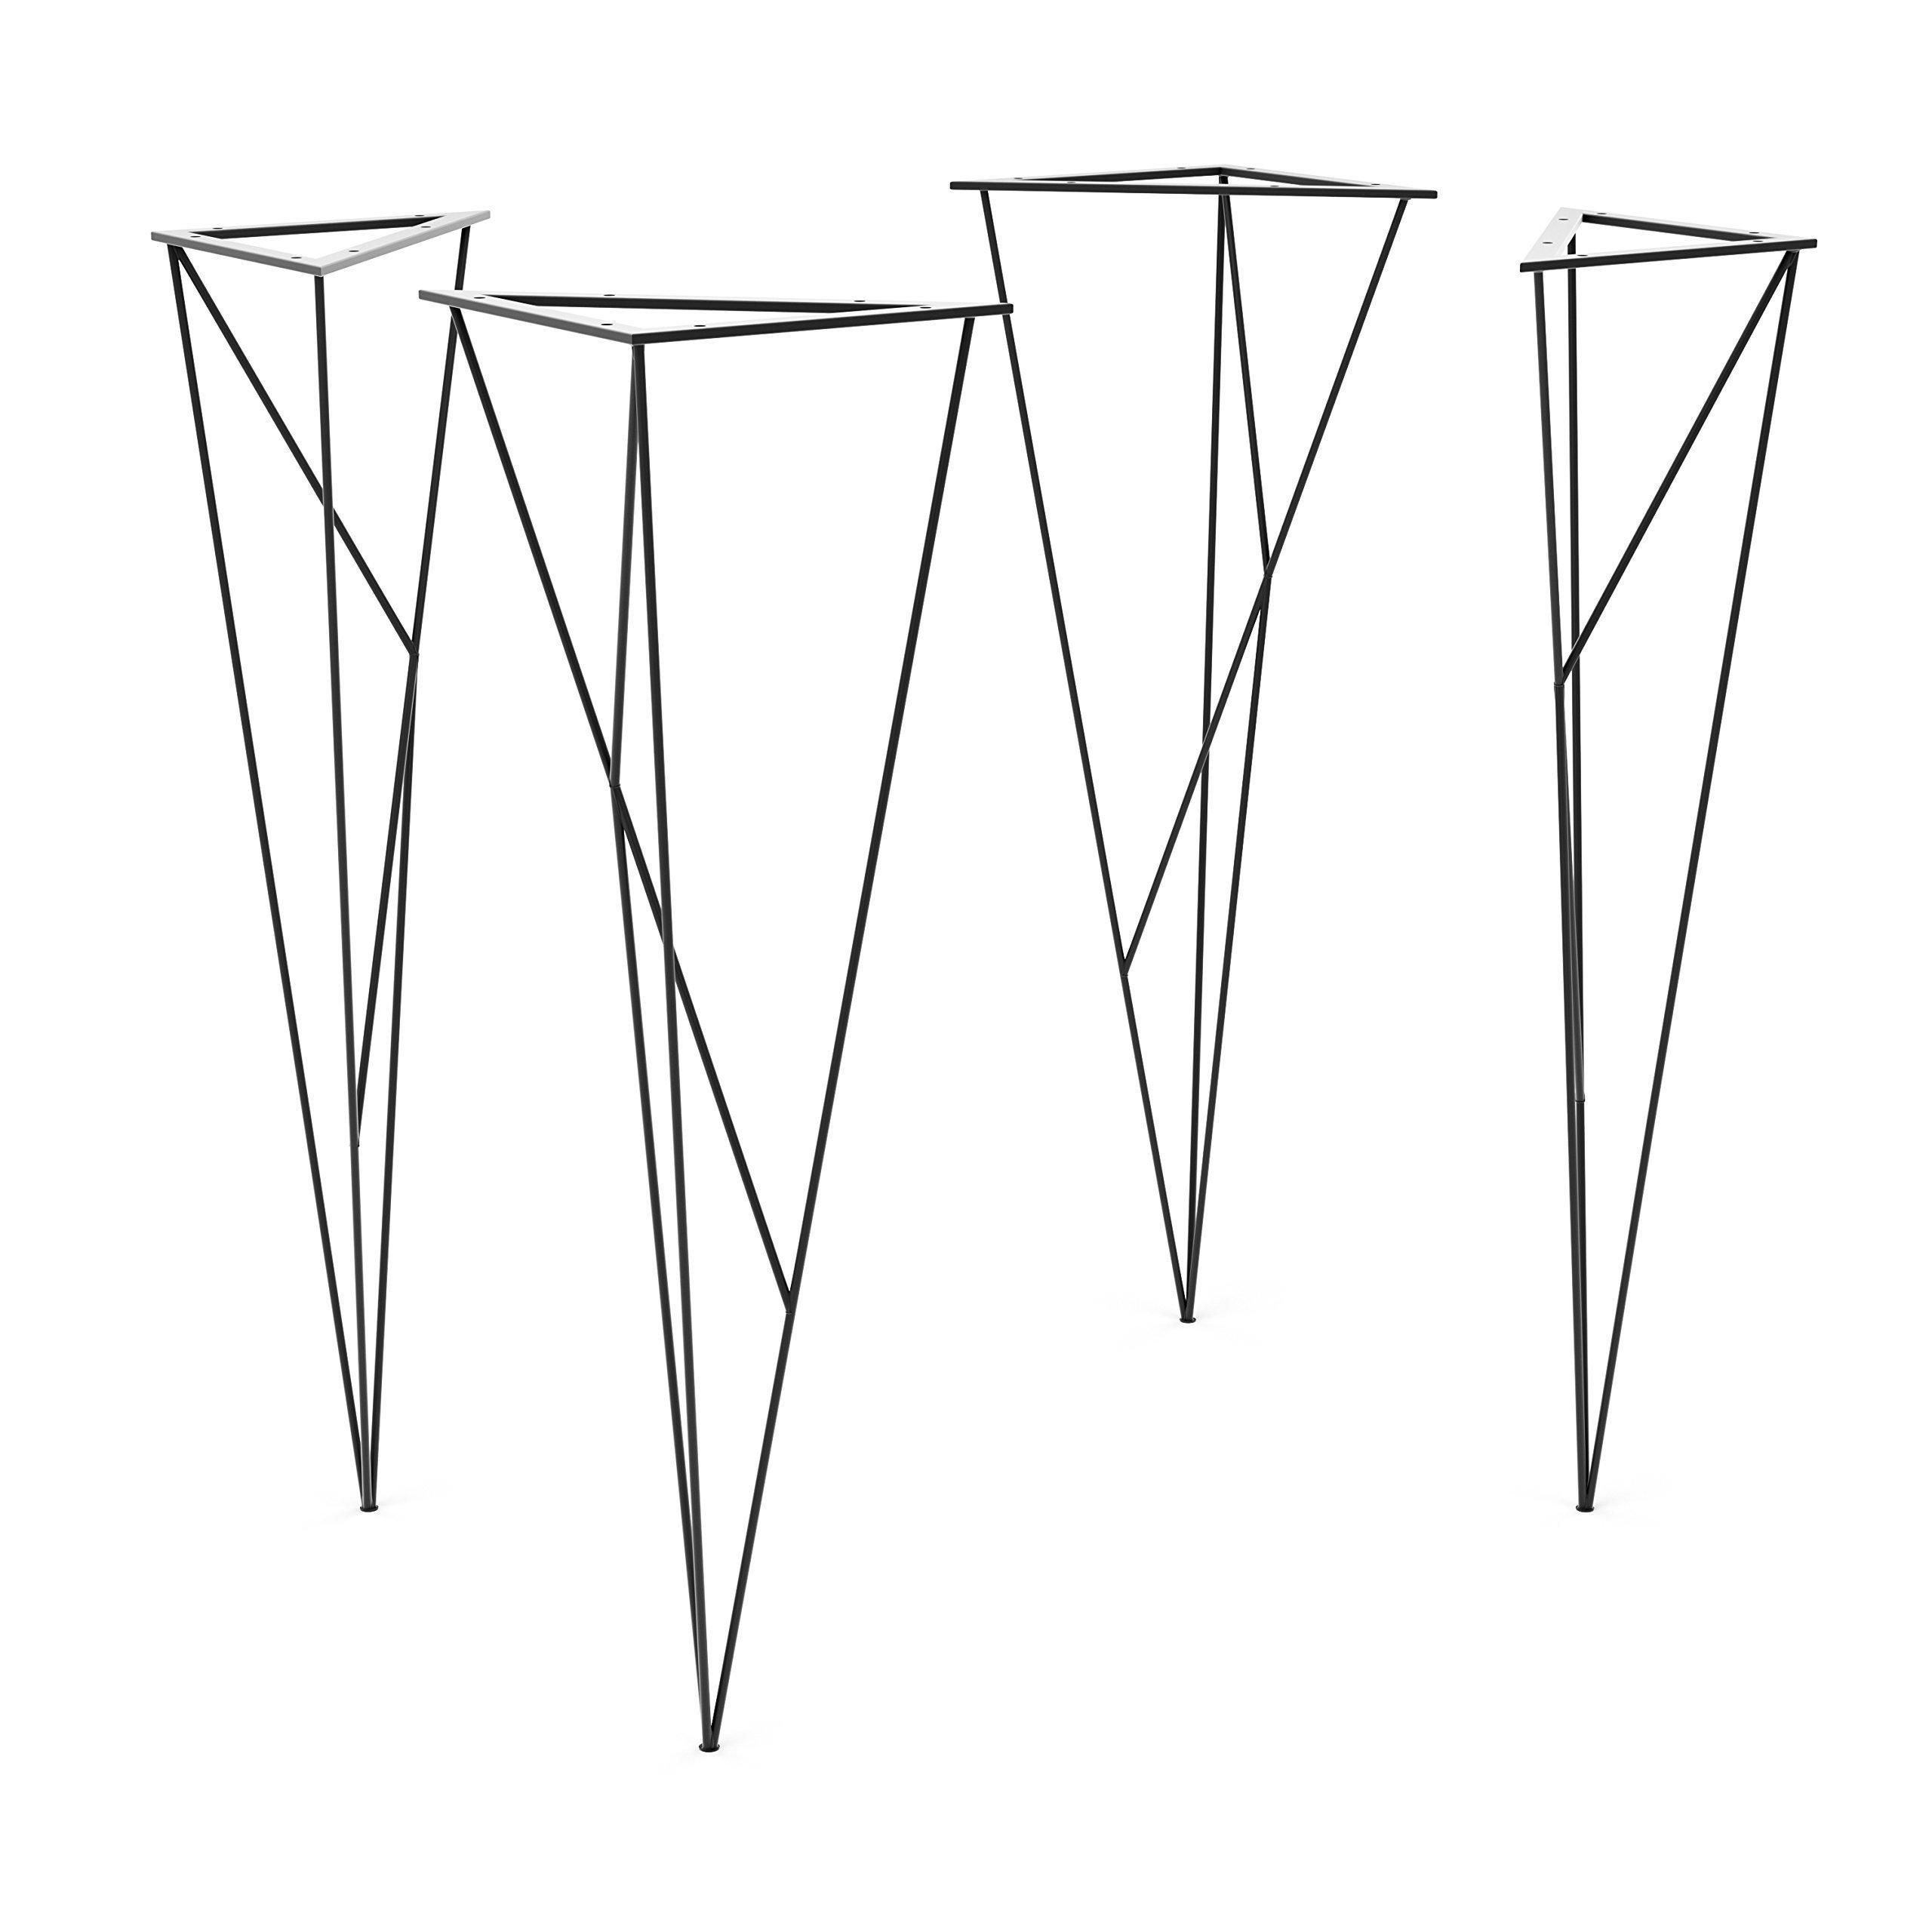 UMBUZÖ Steel Spider Web Hairpin Legs (Set of 4) by UMBUZÖ (Image #1)